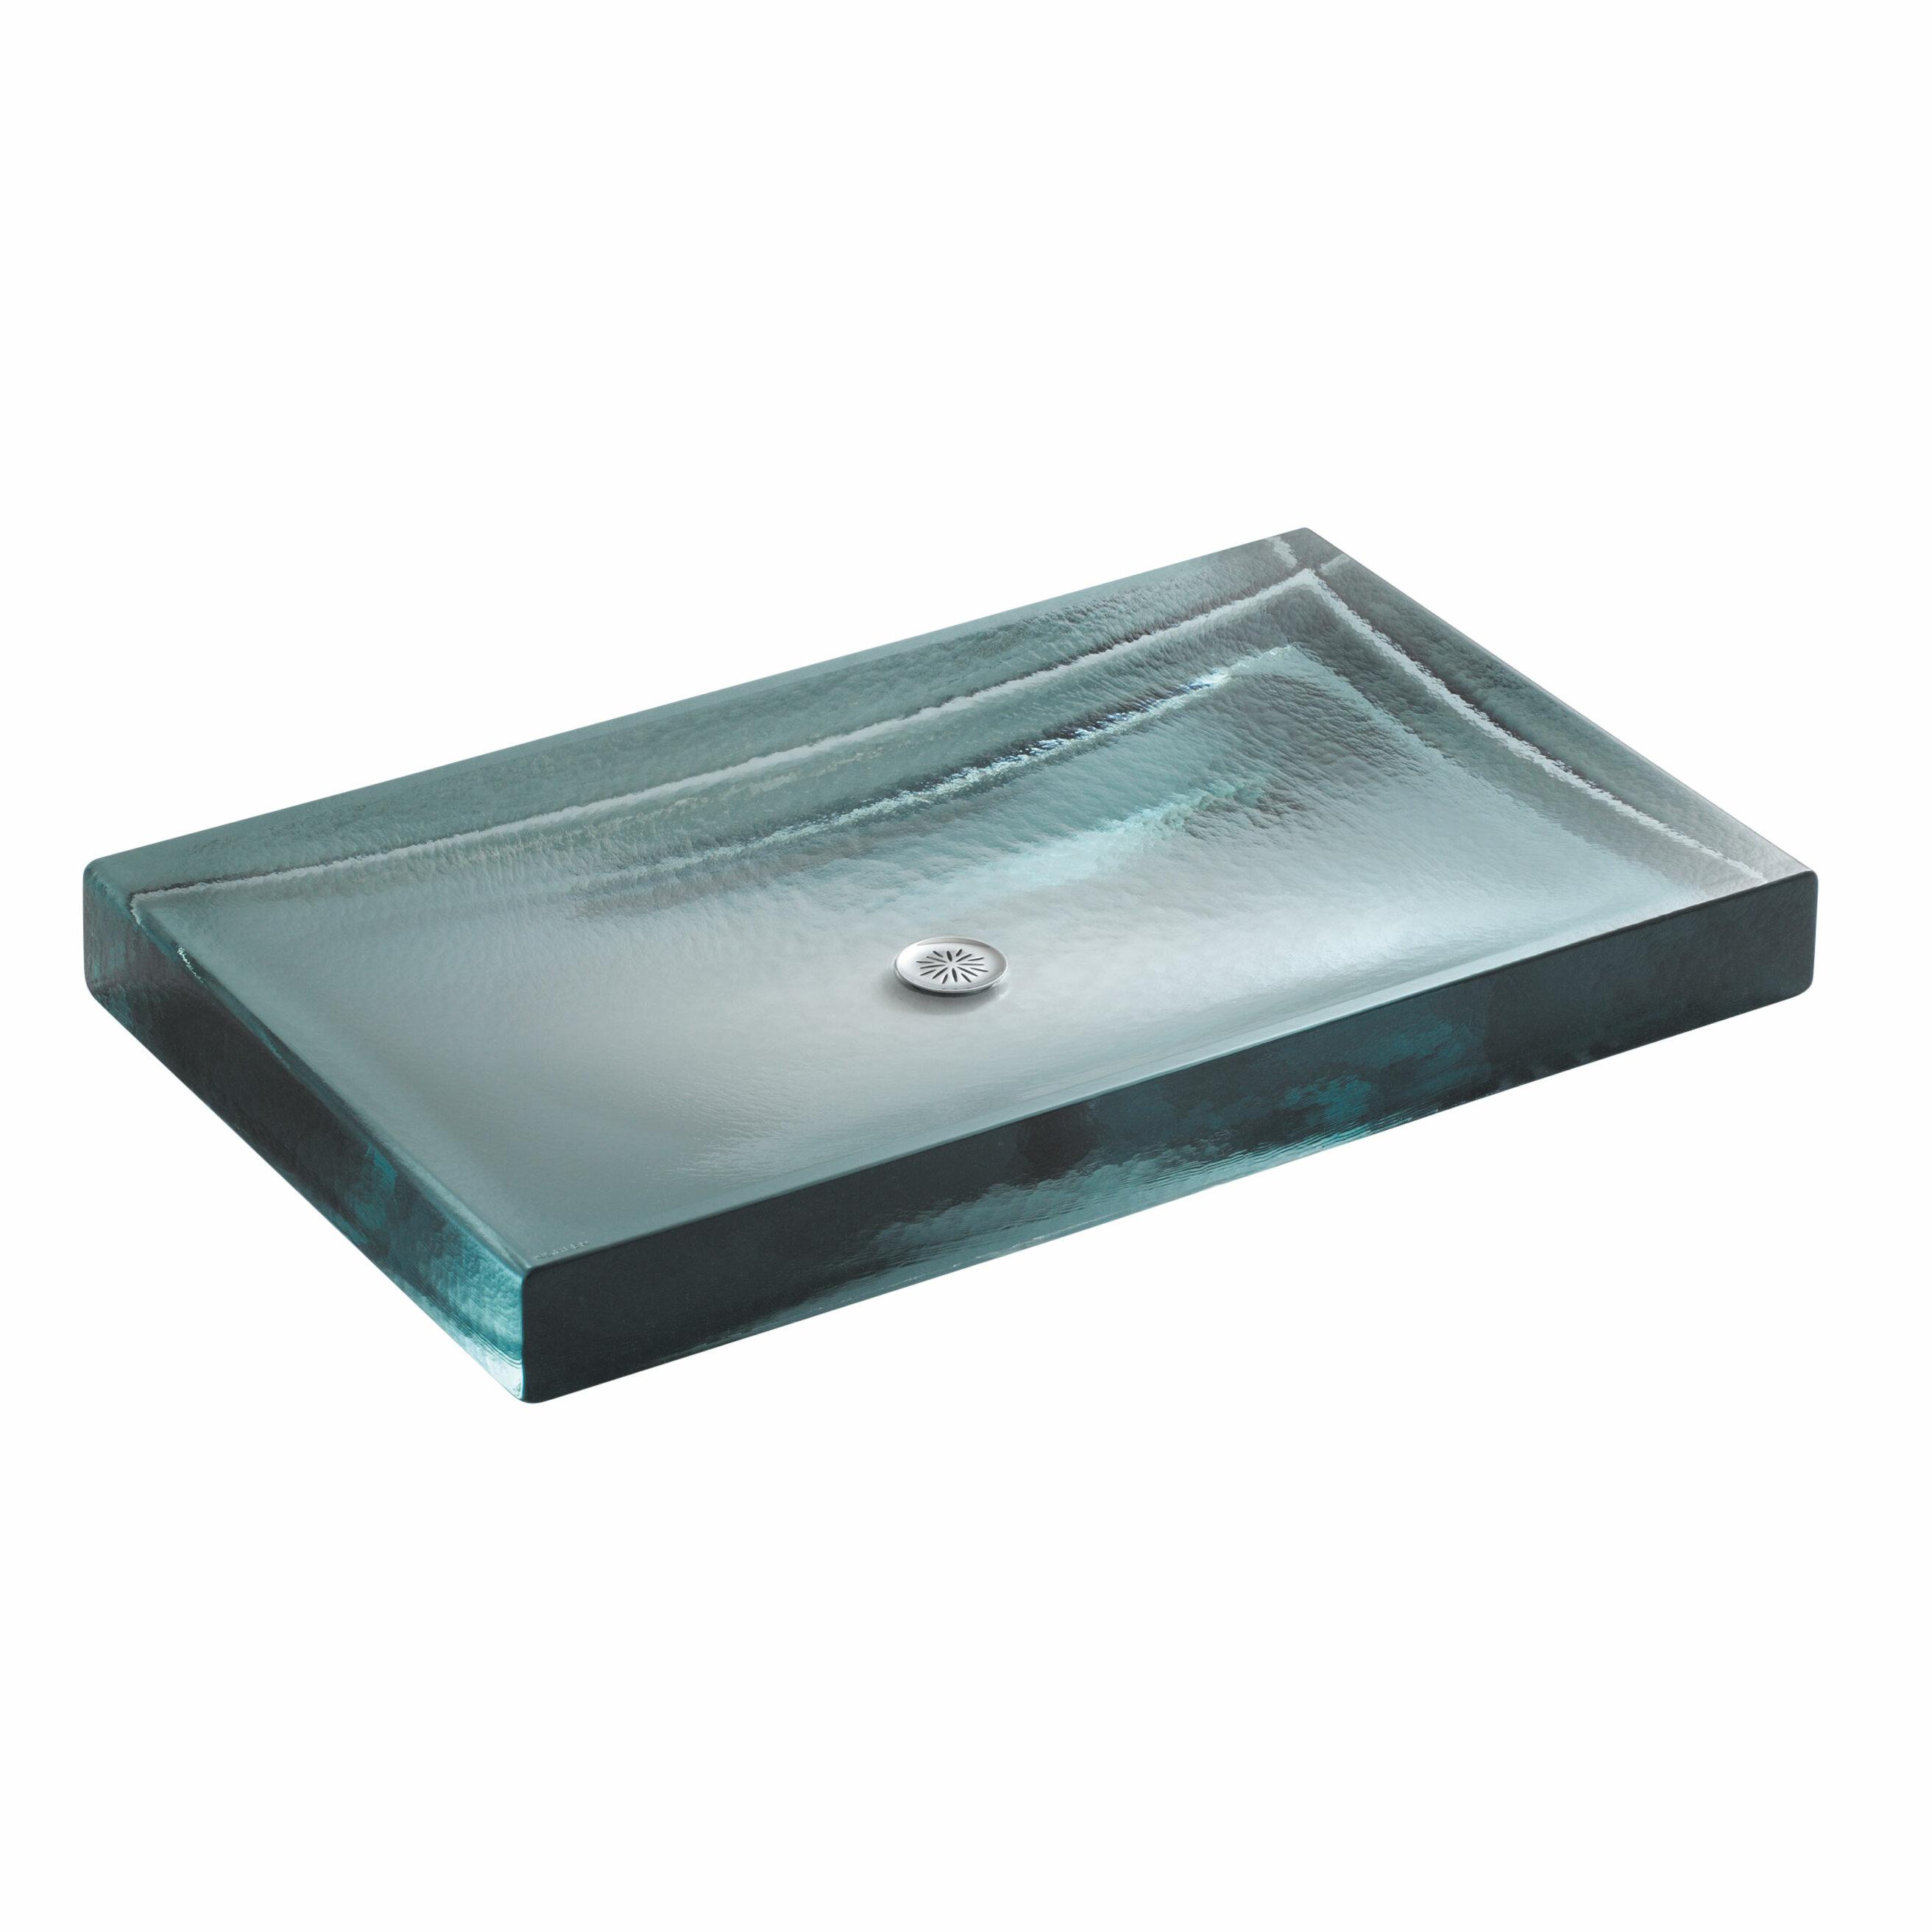 K-2369-B11 Kohler Alteo Glass Rectangular Vessel Bathroom Sink | Wayfair